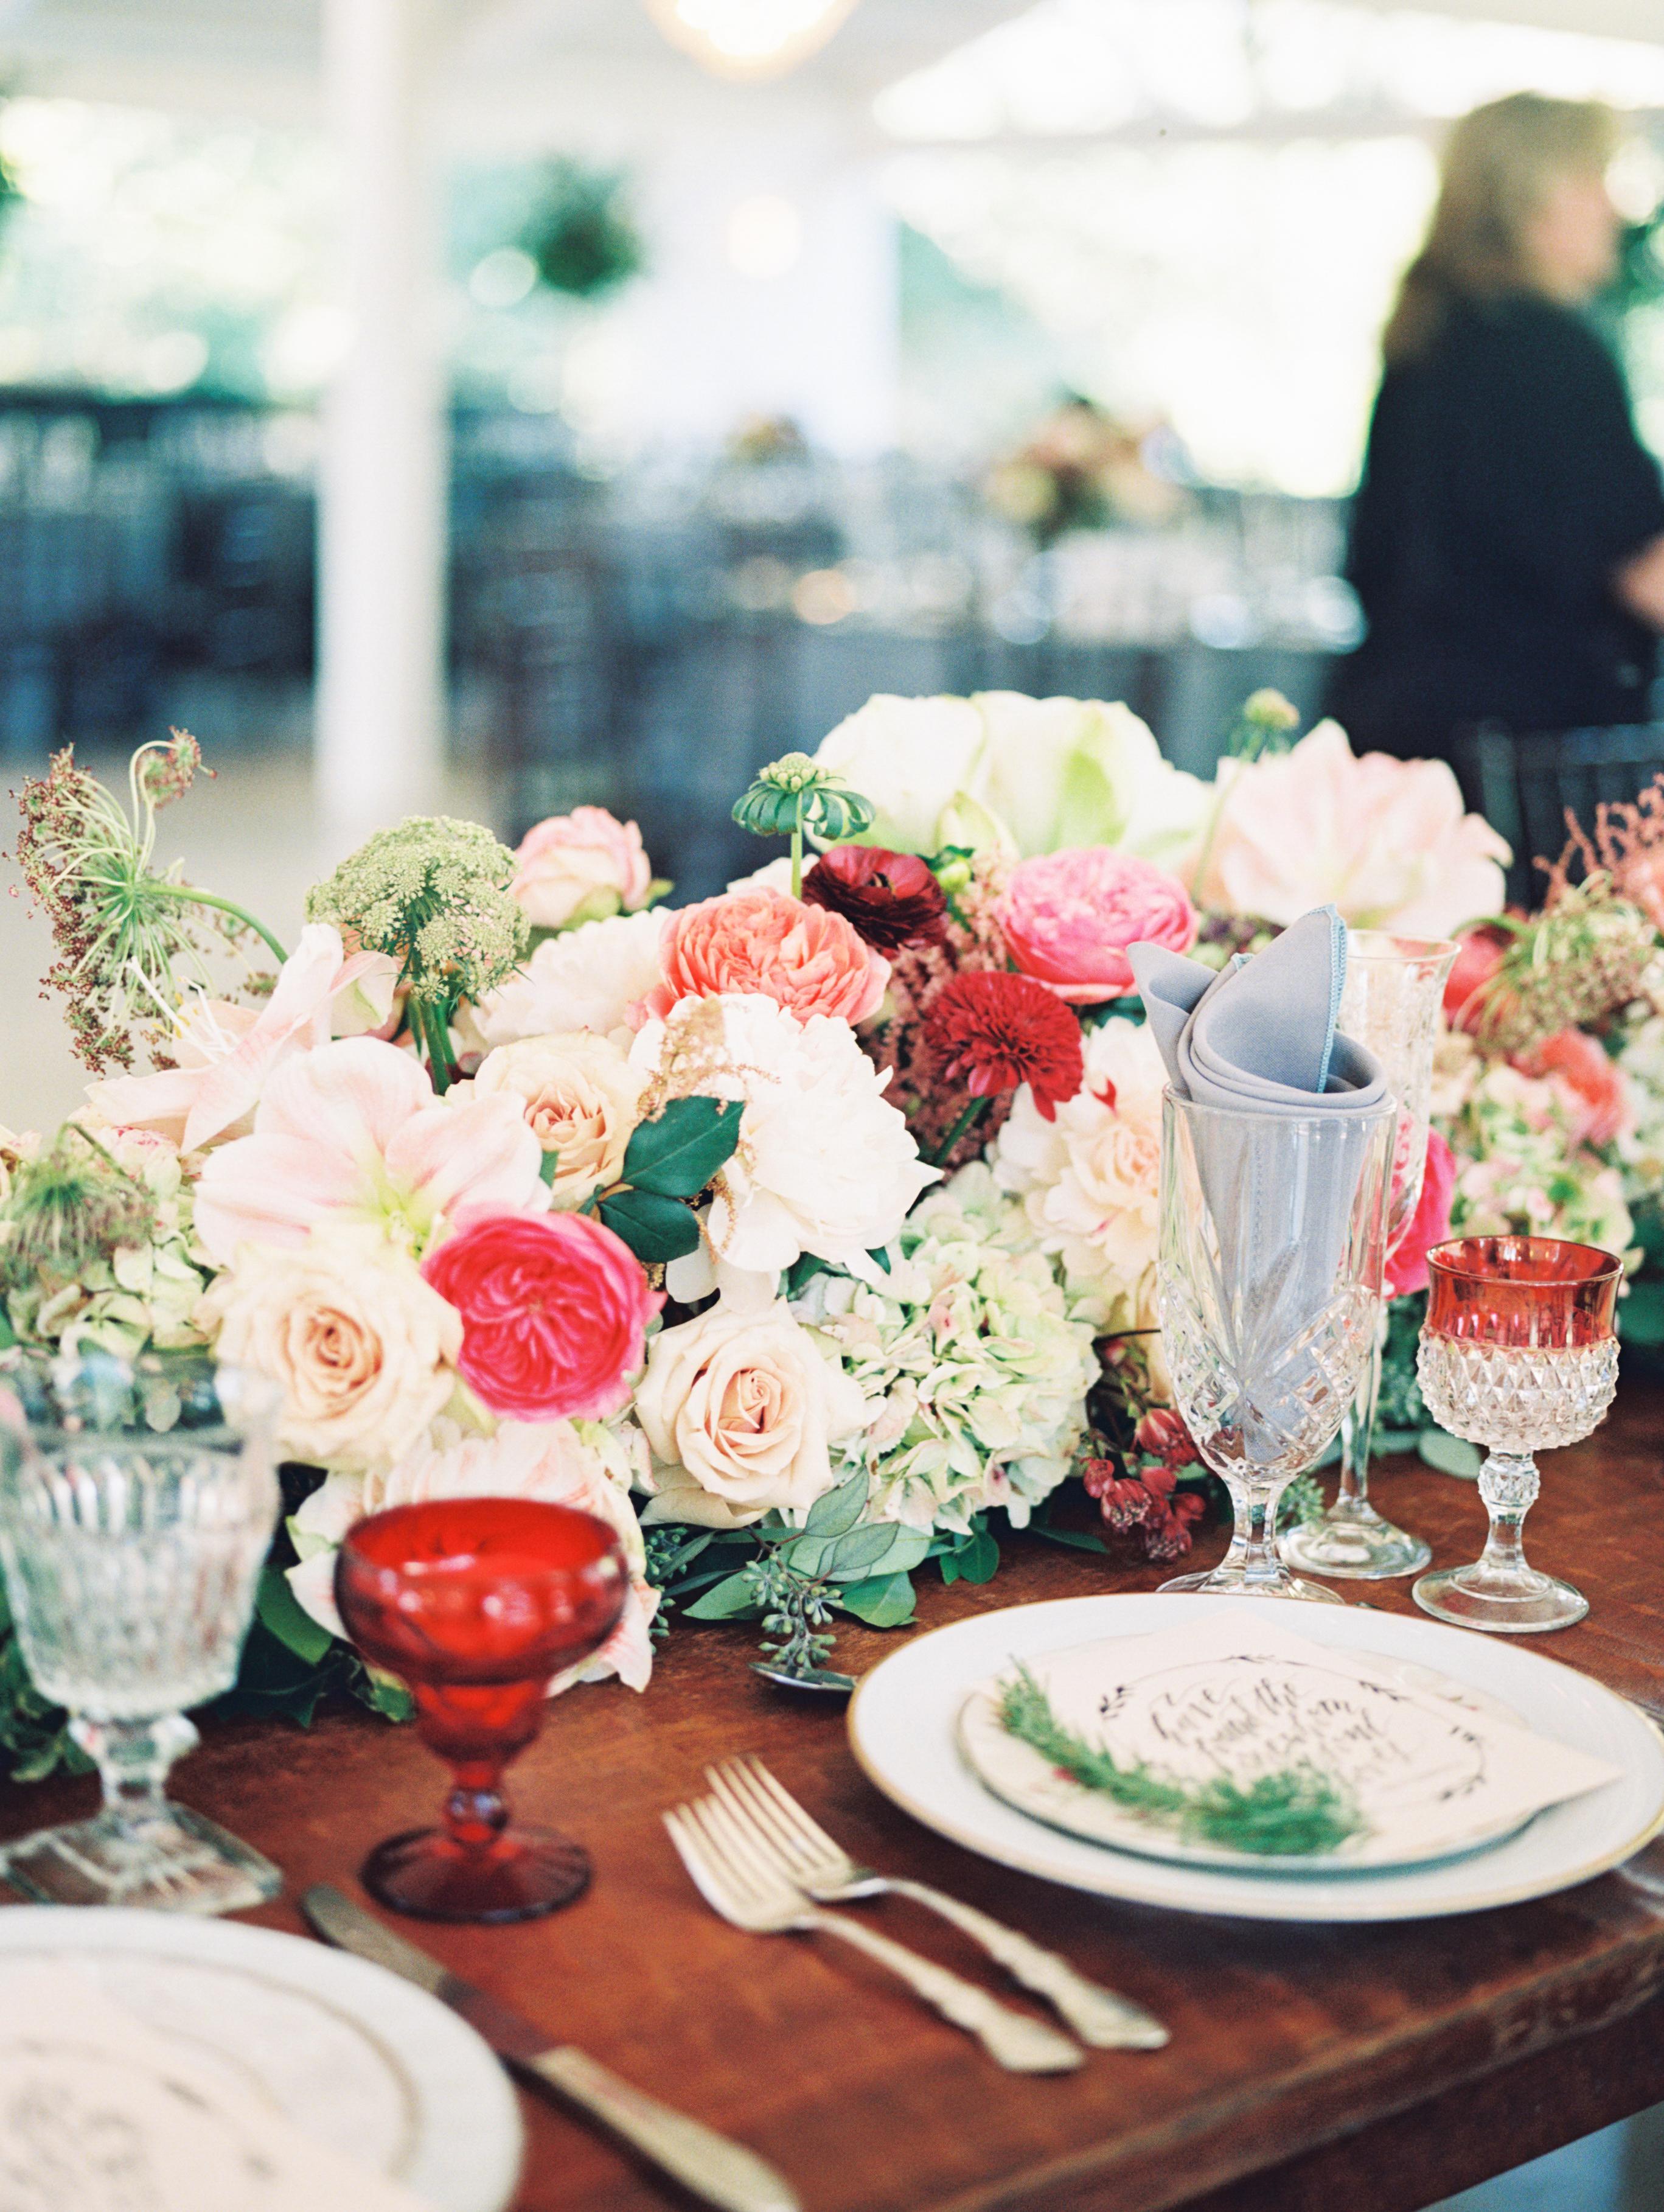 Red and Ivory Wedding Flowers - Elizabeth Anne Designs: The Wedding Blog